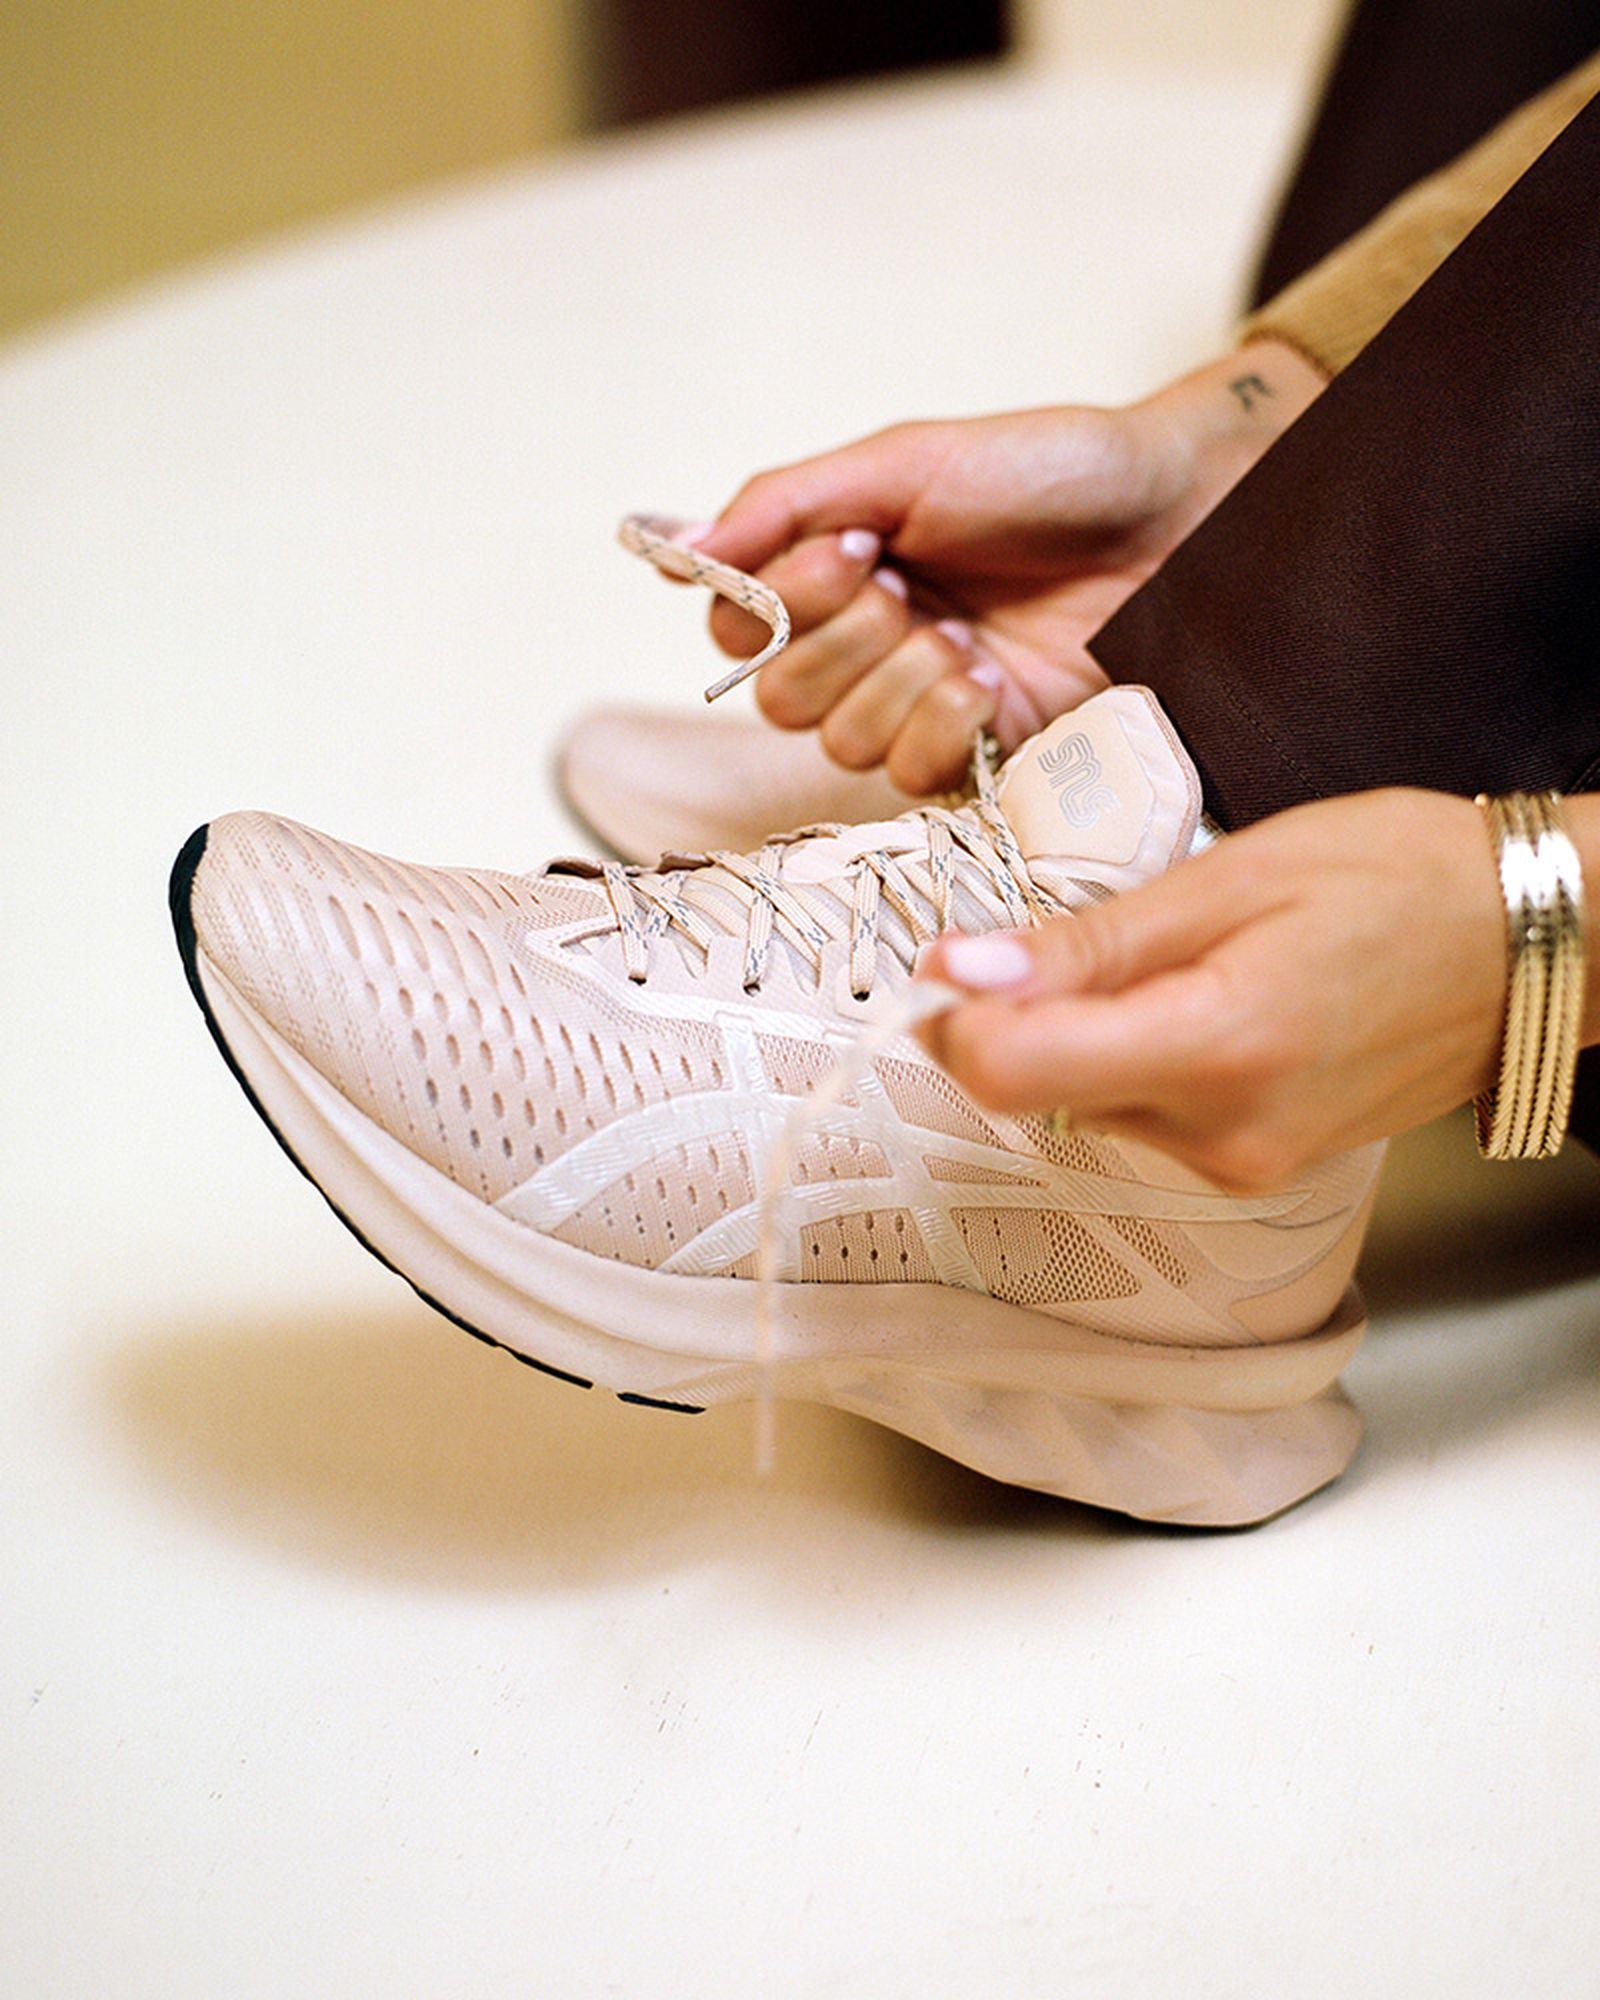 sneakersnstuff-asics-novablast-release-date-price-10